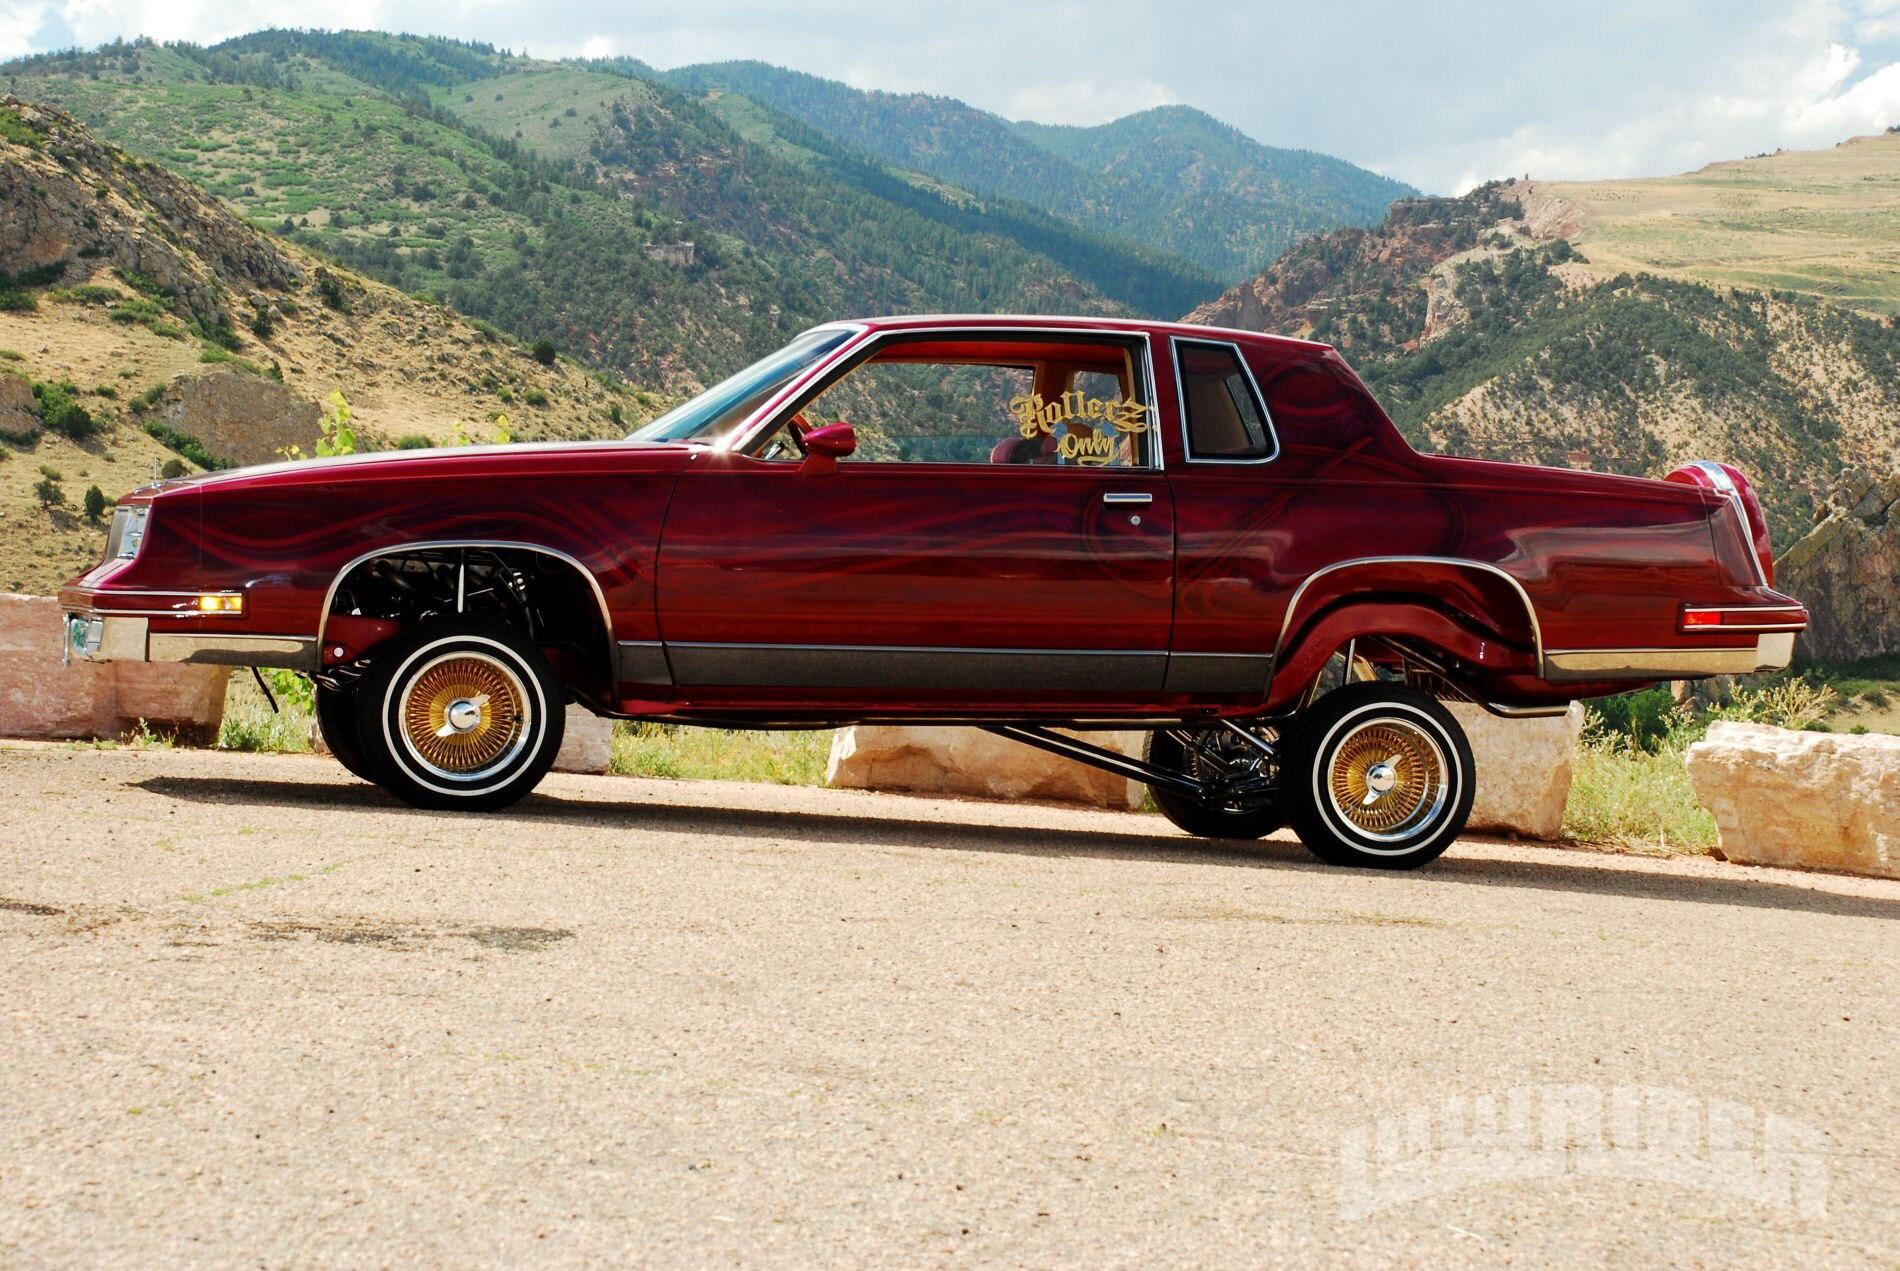 lrmp-1111-01-o-1983-oldsmobile-cutlass-side3